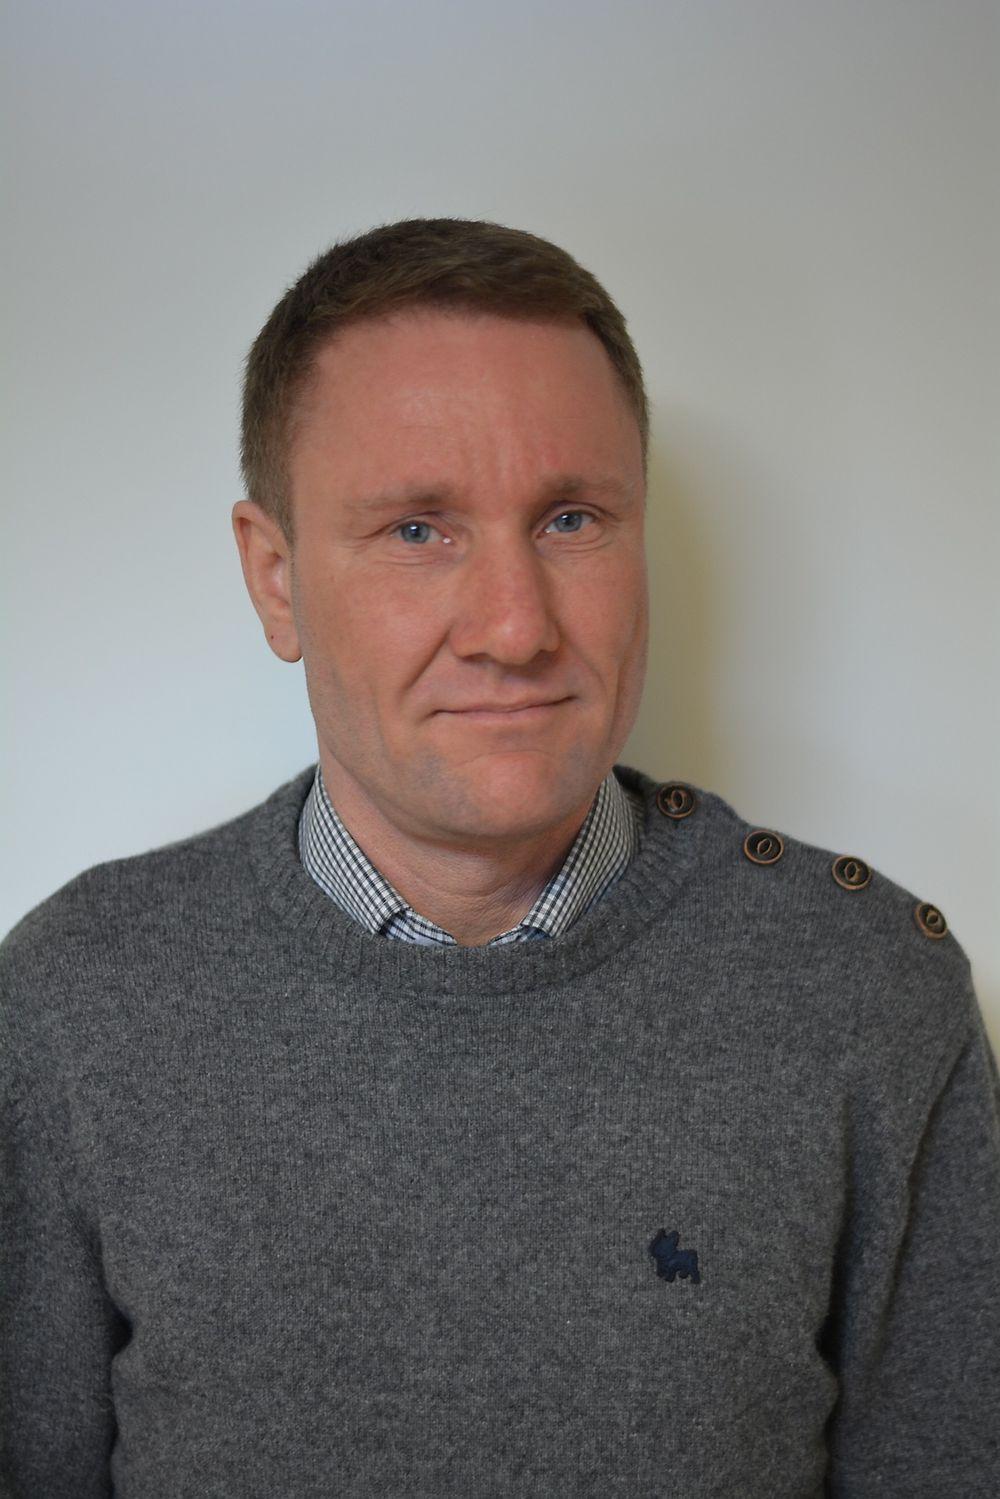 Invensys Operations Management har ansatt Aksel Lindberg på salgsavdelingen.